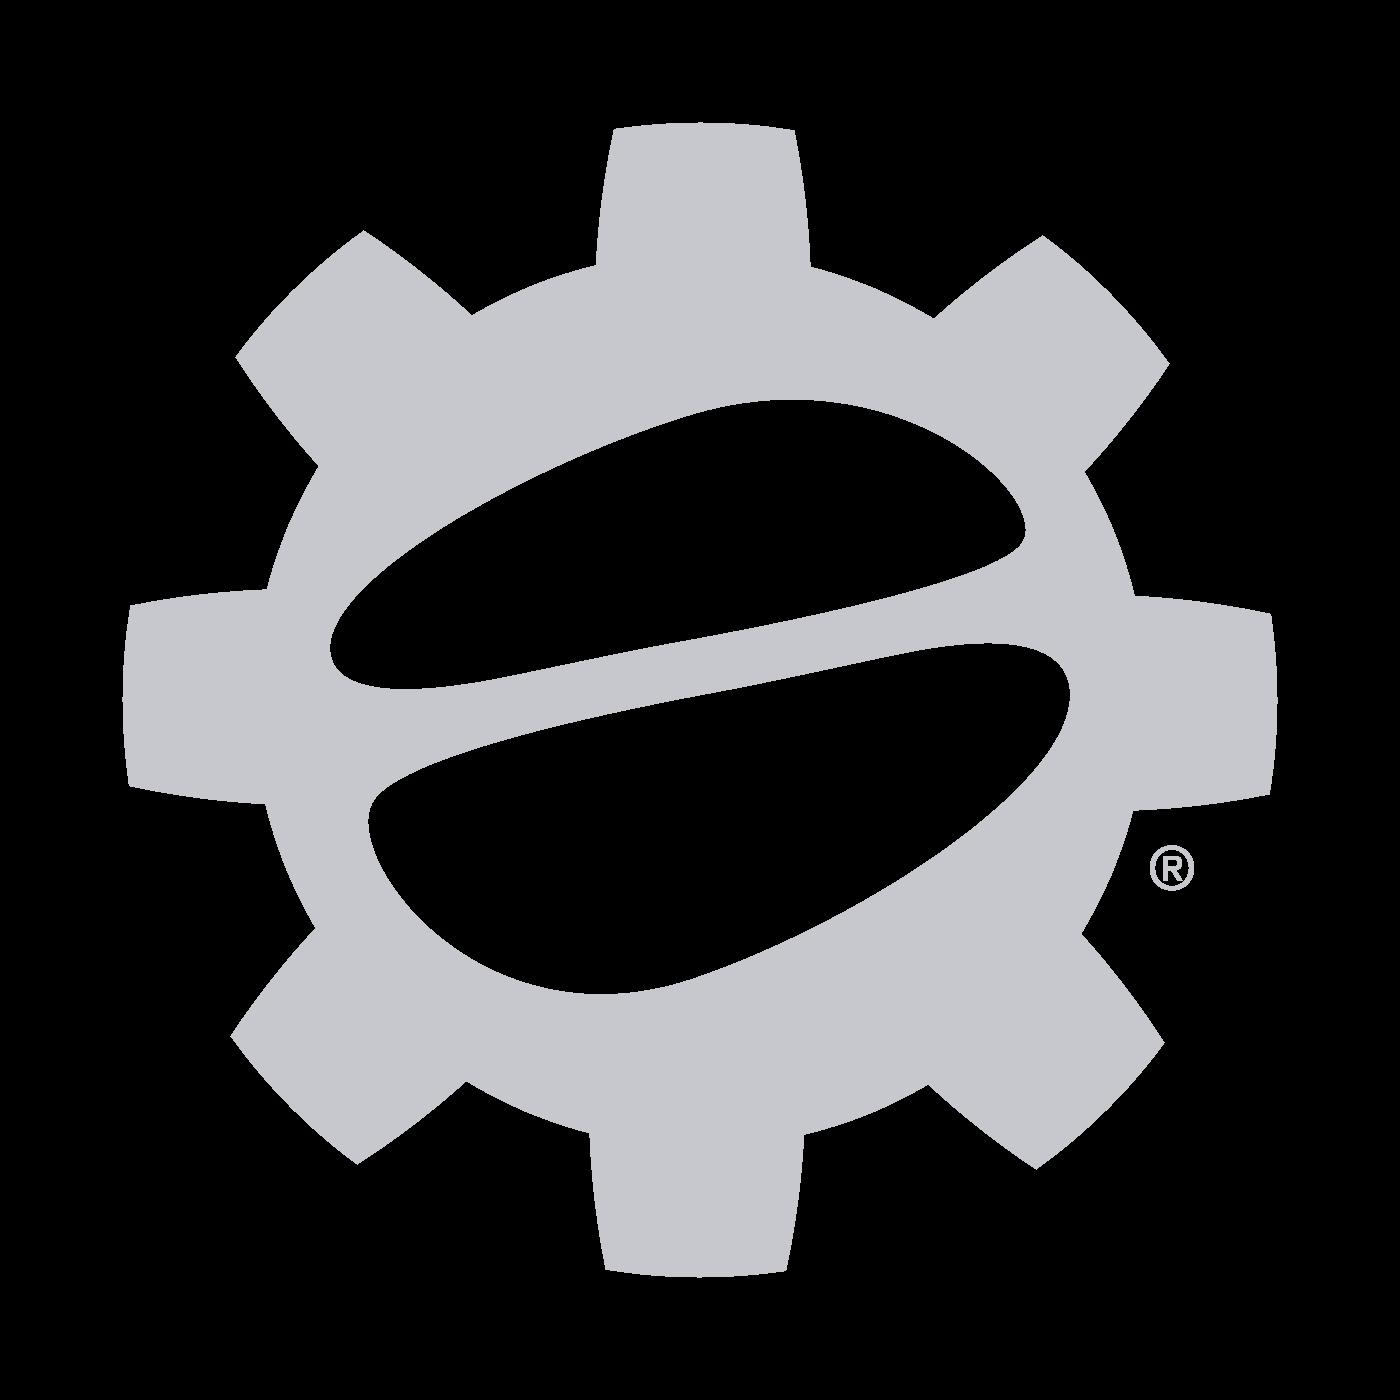 Breville Dual Boiler Espresso Machine BES920XL - Stainless Steel